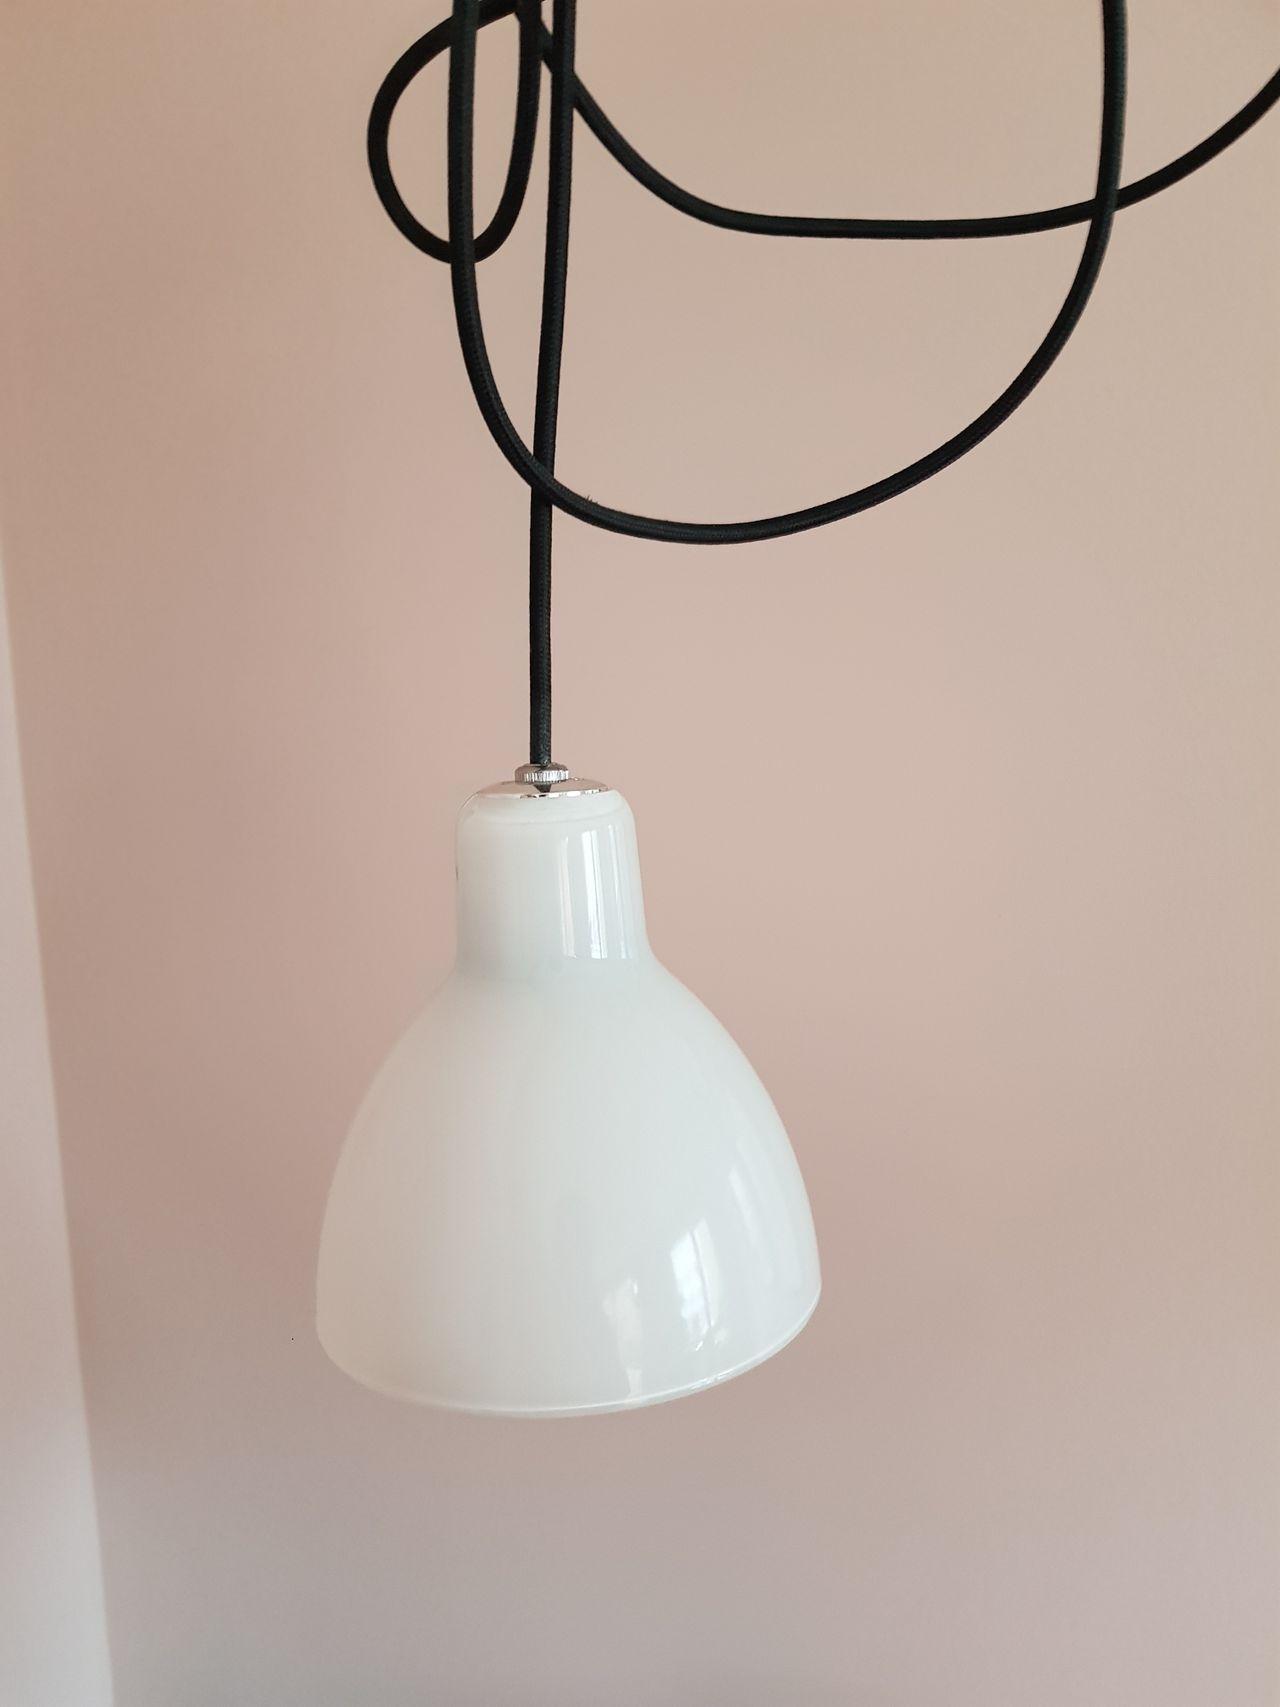 FRIHULT Tak vegglampe svart | Vegglampe, Lyspærer, Taklampe